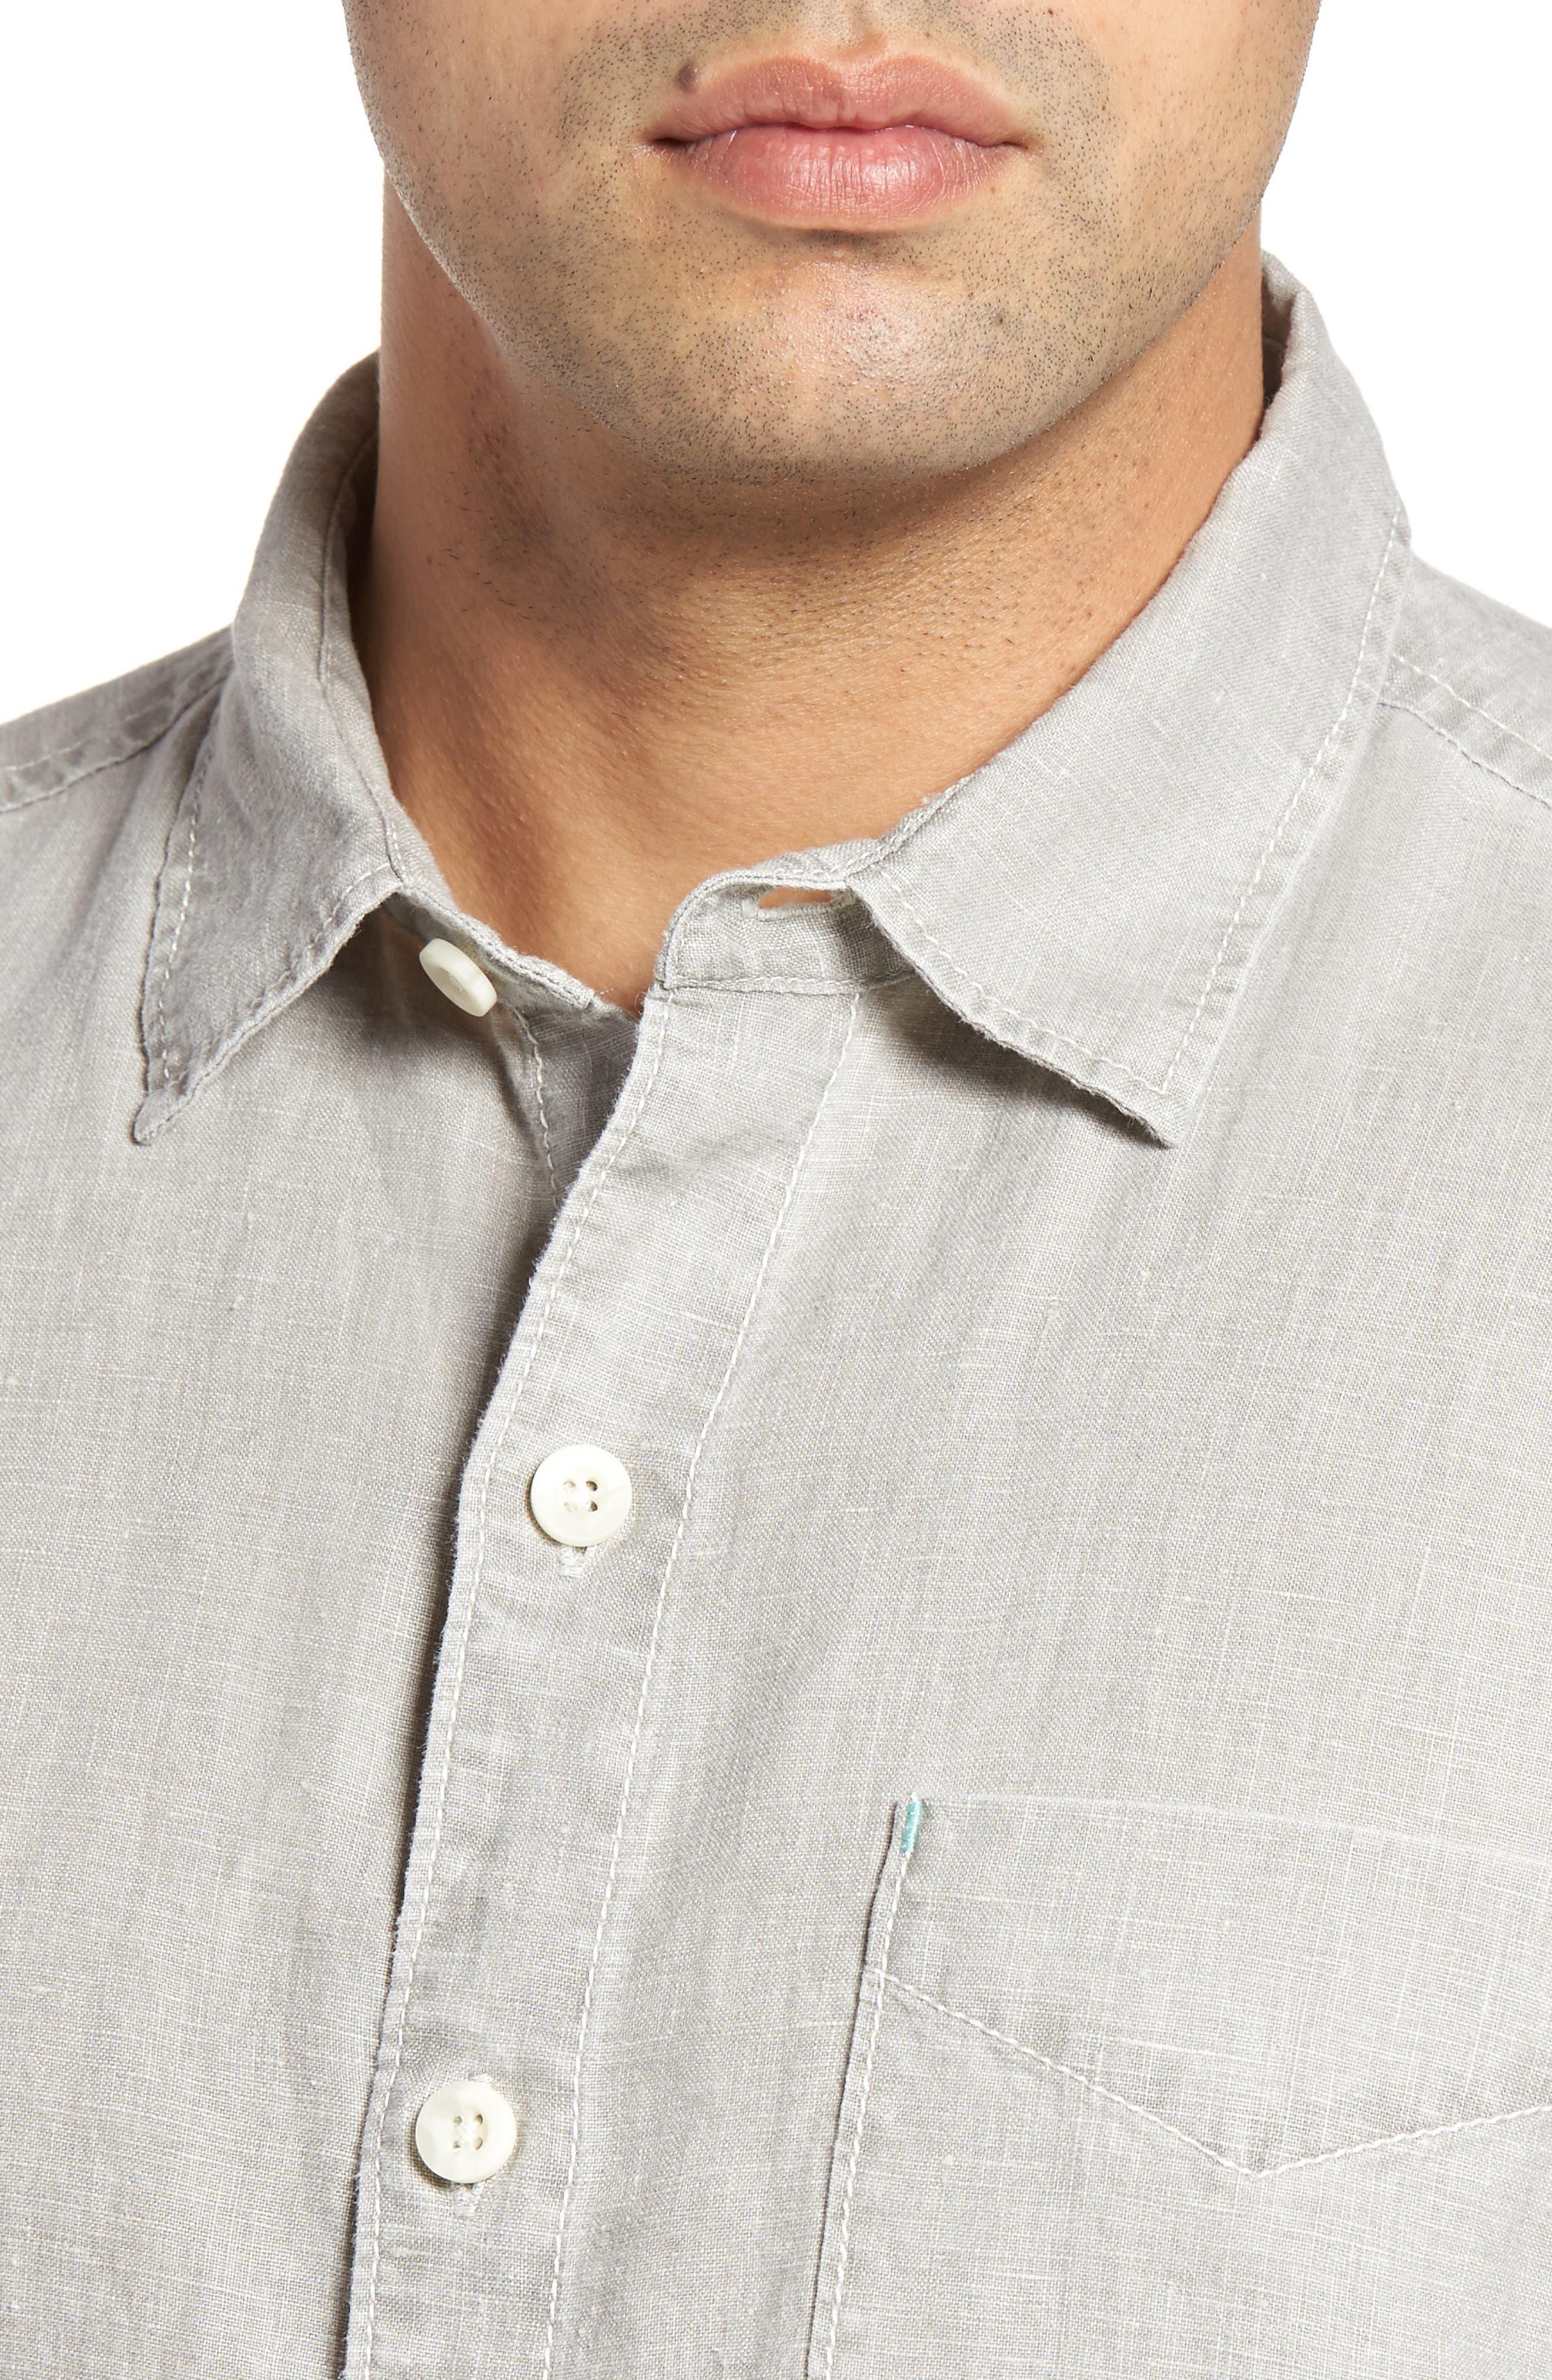 TOMMY BAHAMA, 'Sea Glass Breezer' Original Fit Linen Shirt, Alternate thumbnail 4, color, LIGHT GREY